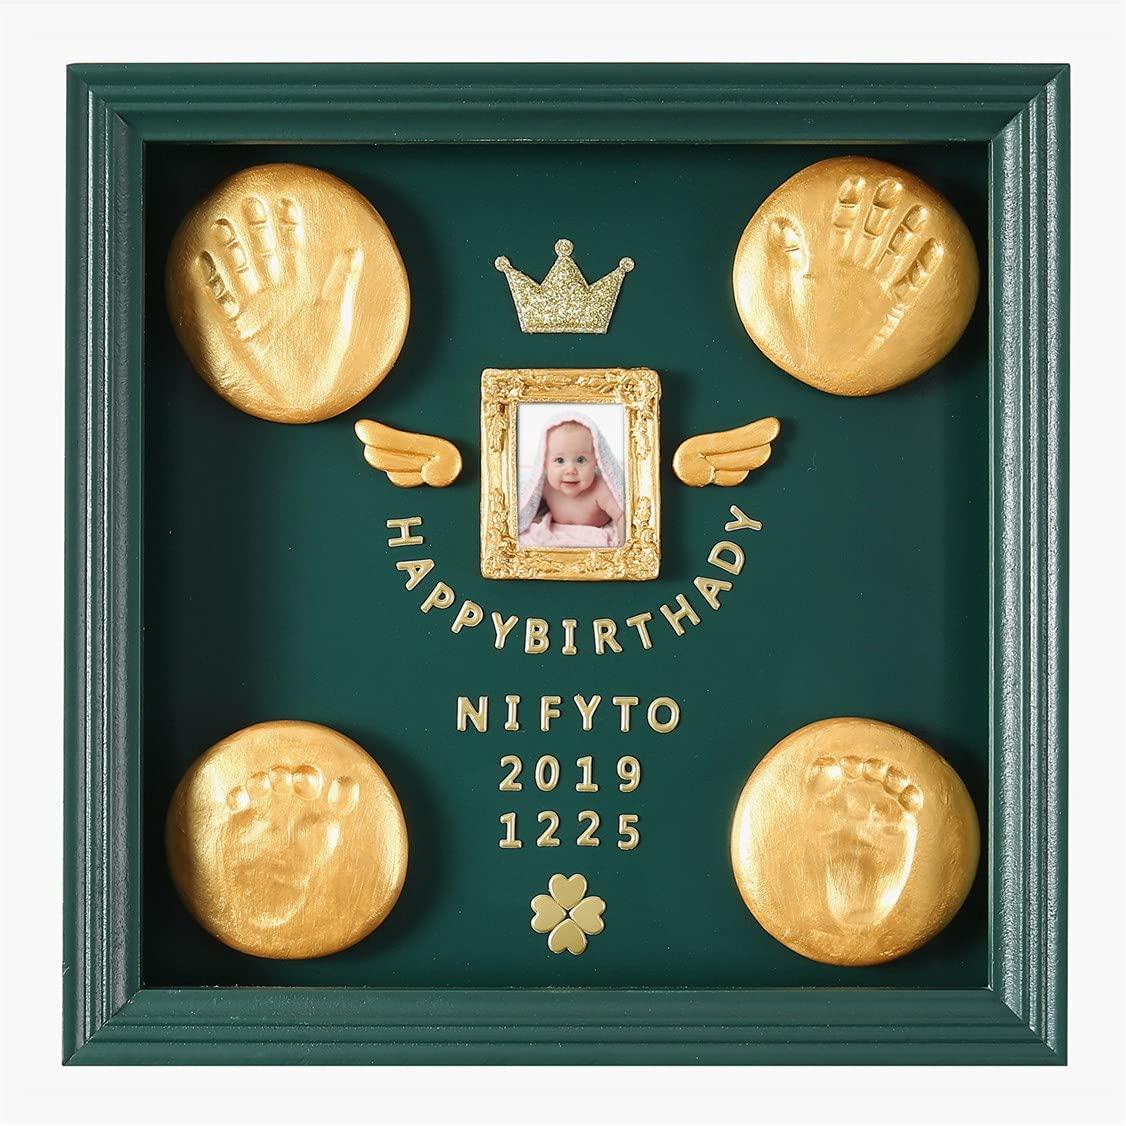 Nifyto Baby Handprint Footprint Ornament Keepsake Kit, Baby Nursery Memory Art Kit, Baby Shower Gifts, Xmas Gifts, Precious Moment for Newborn,Baby Boy/Girl, Personalized Baby Prints(DarkGreen)…